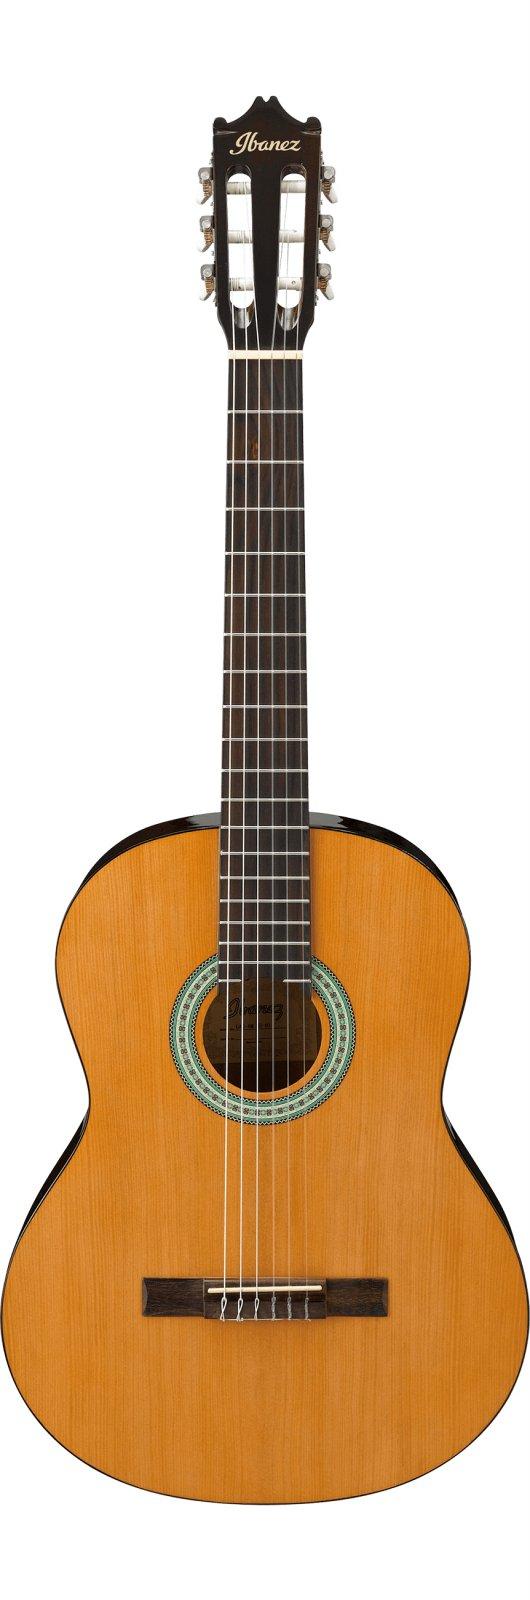 Ibanez GA3 Classical Spruce Top Acoustic Guitar - Natural